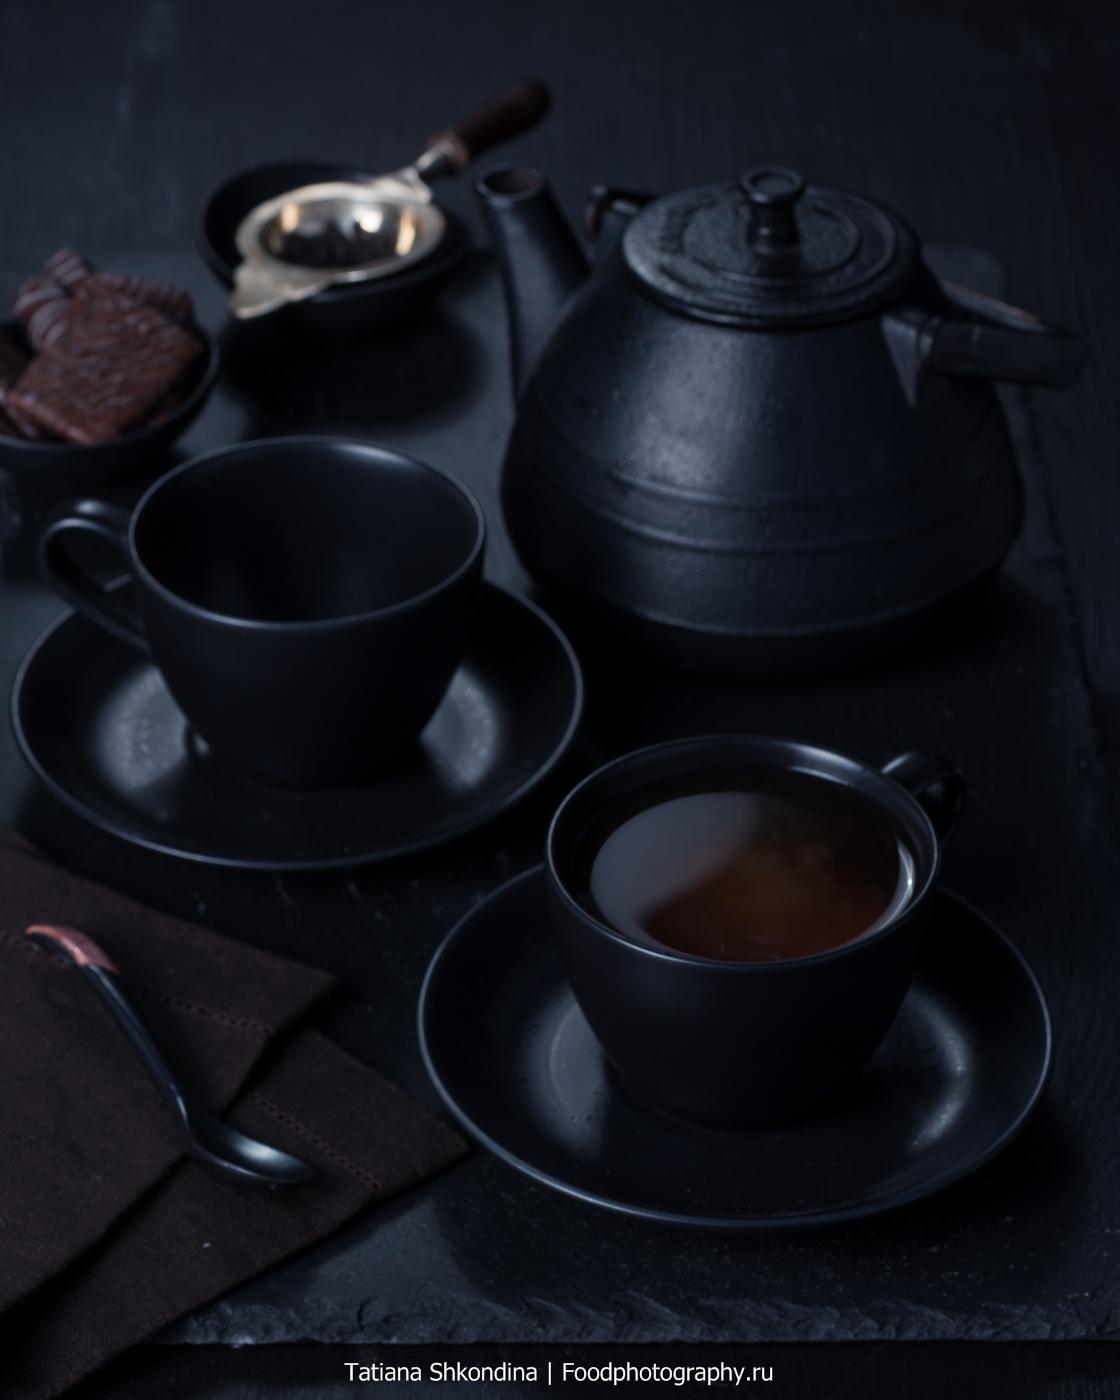 Tea time / фото Татьяна Шкондина